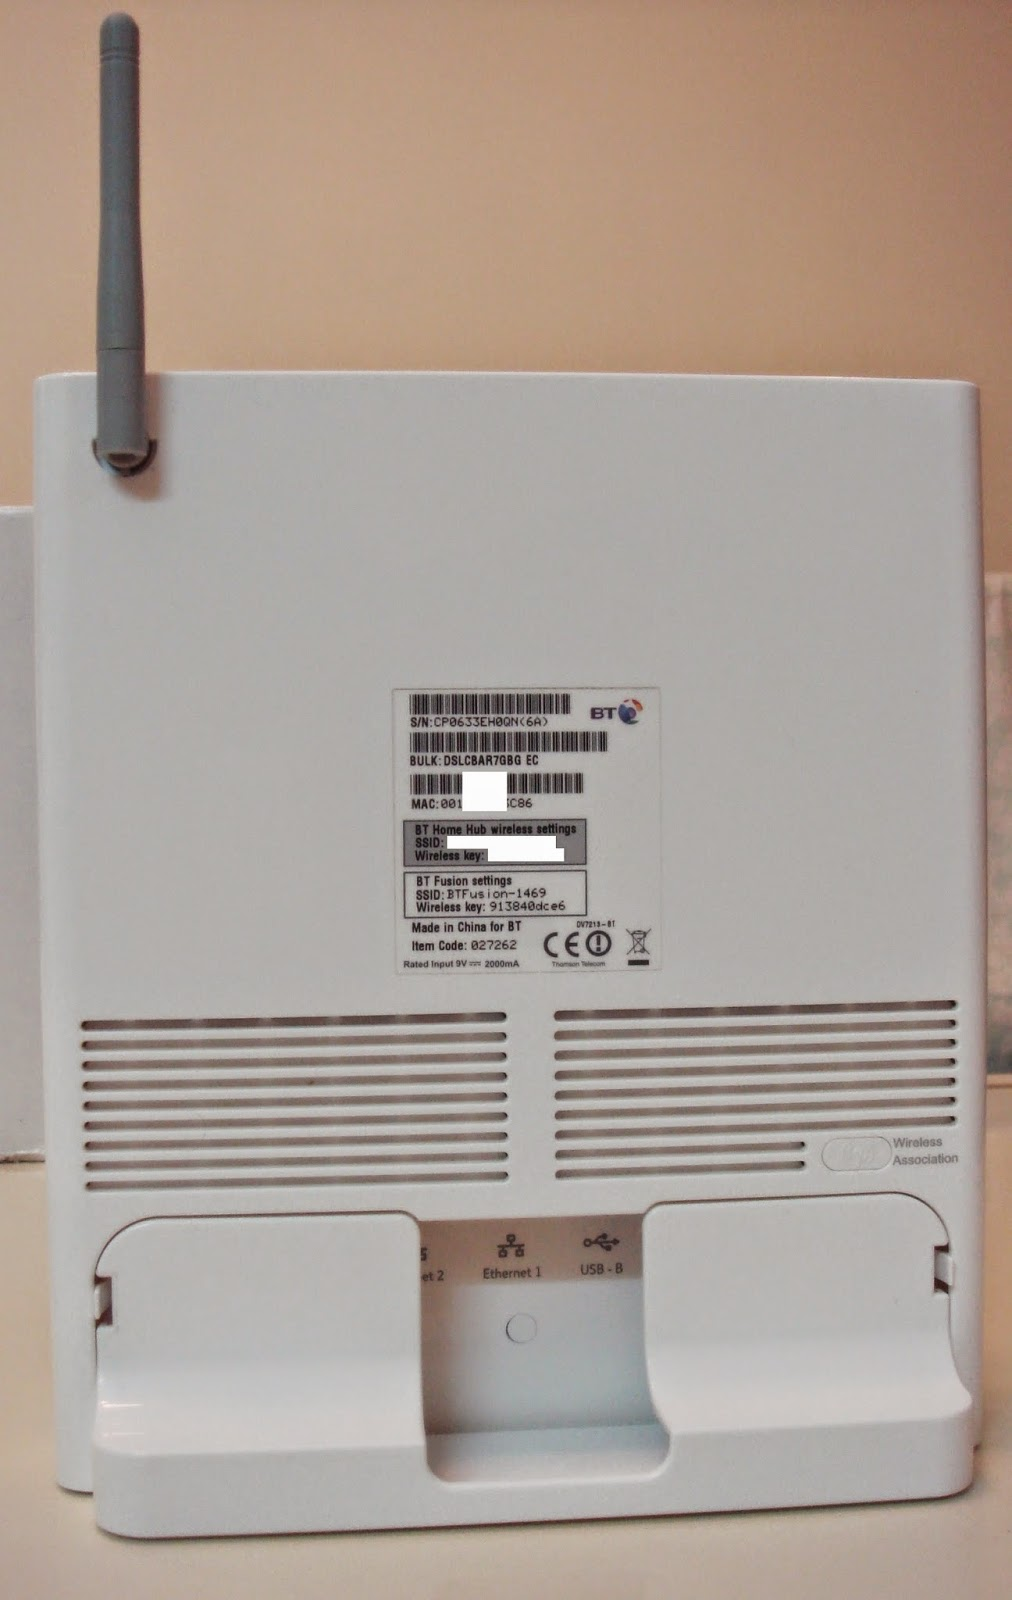 BT Home Hub v1 and v1 5 1/2: Info, Unlock & Configuration